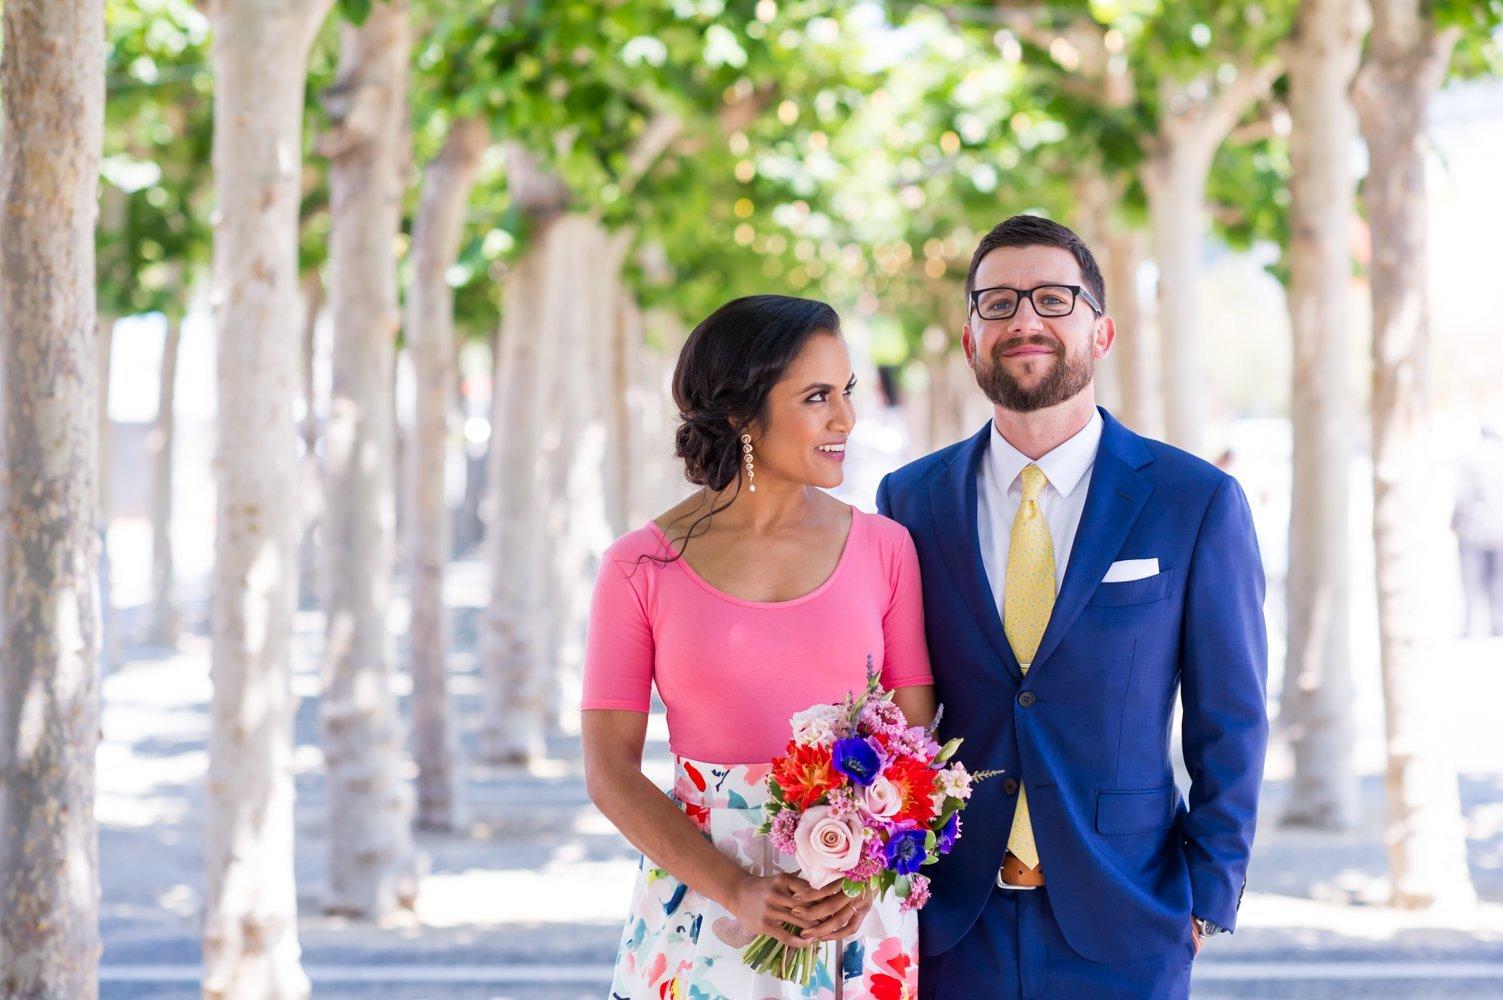 Sneak Peek of Mat & Rumana's Intimate City Hall Wedding